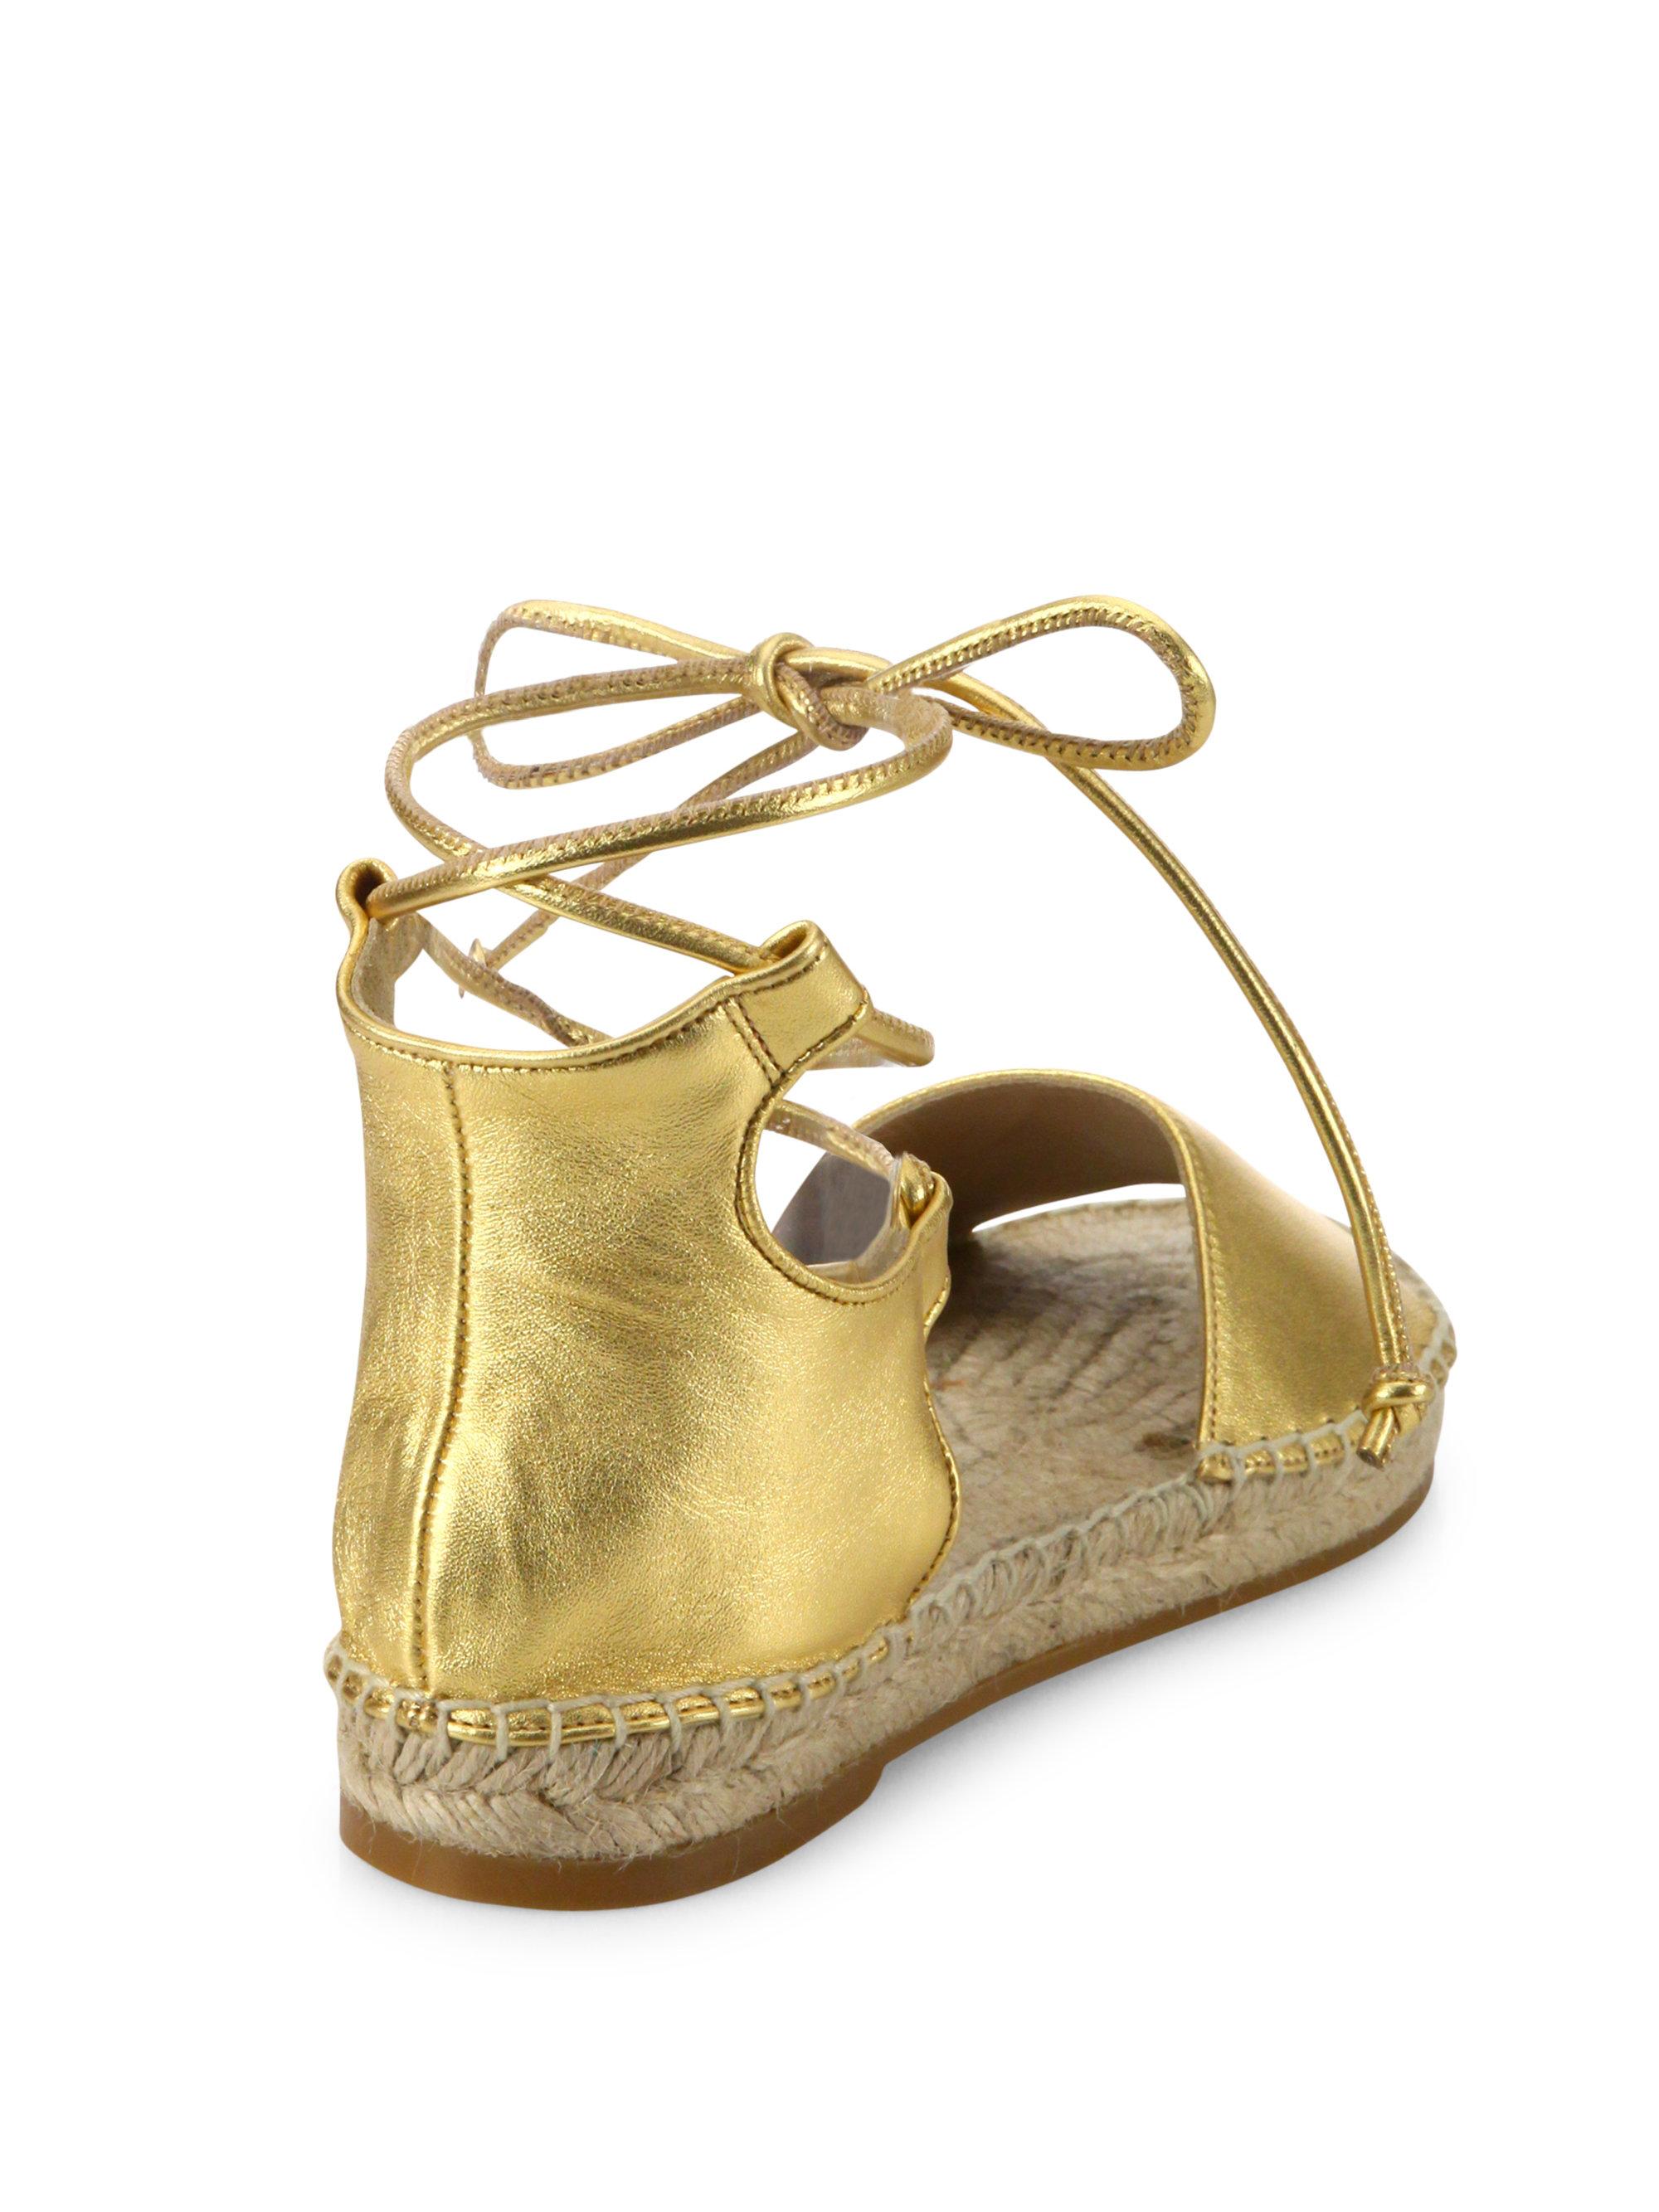 fa71dd2e139 Lyst - Diane von Furstenberg Dakota Metallic Leather Gladiator Espadrille  Sandals in Metallic